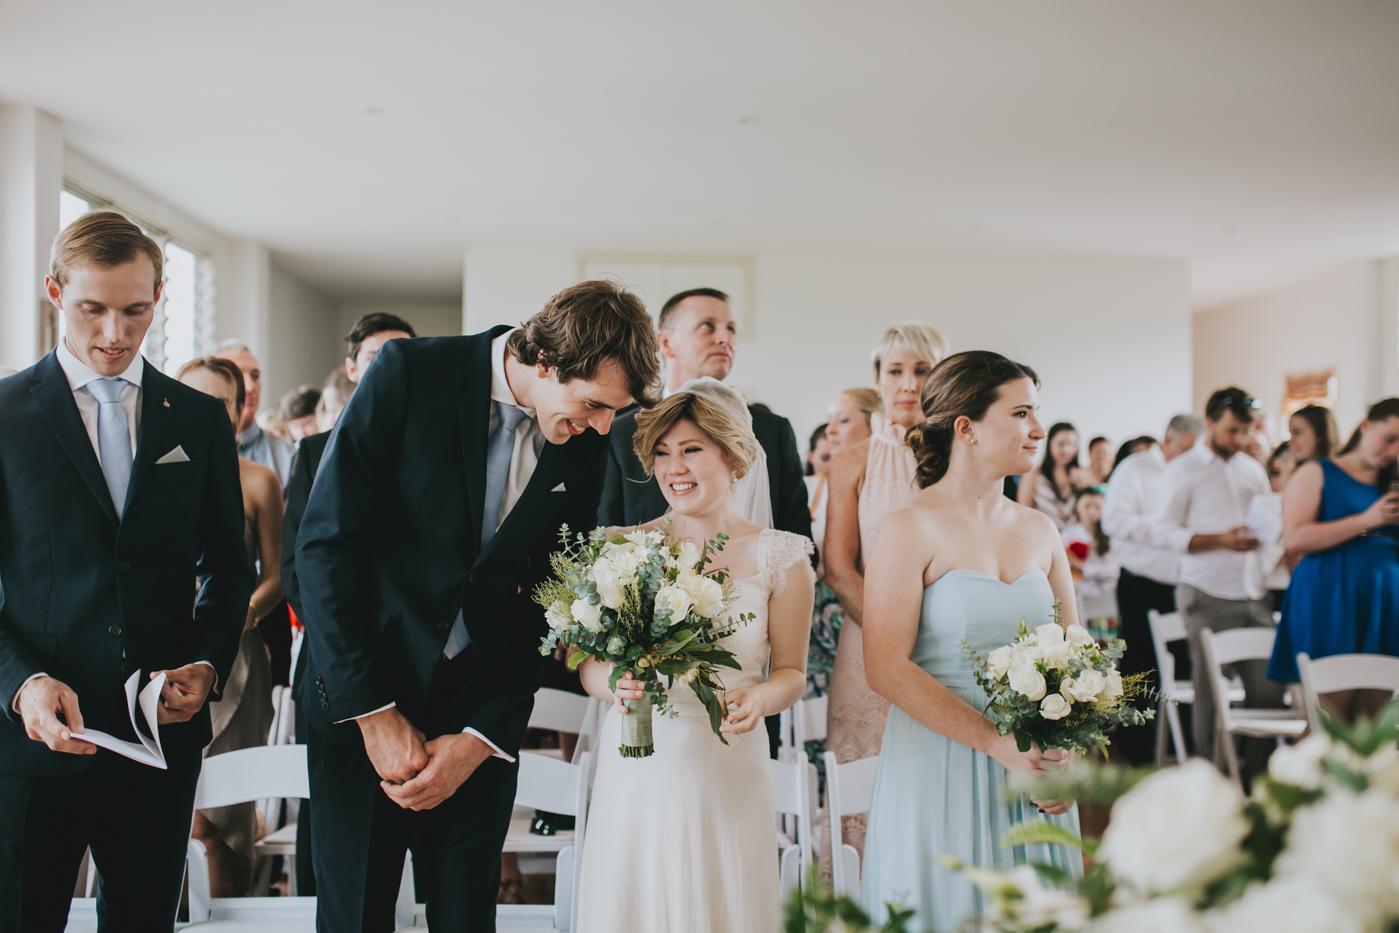 Rachel & Jacob - Willow Farm Berry - South Coast Wedding - Samantha Heather Photography-69.jpg